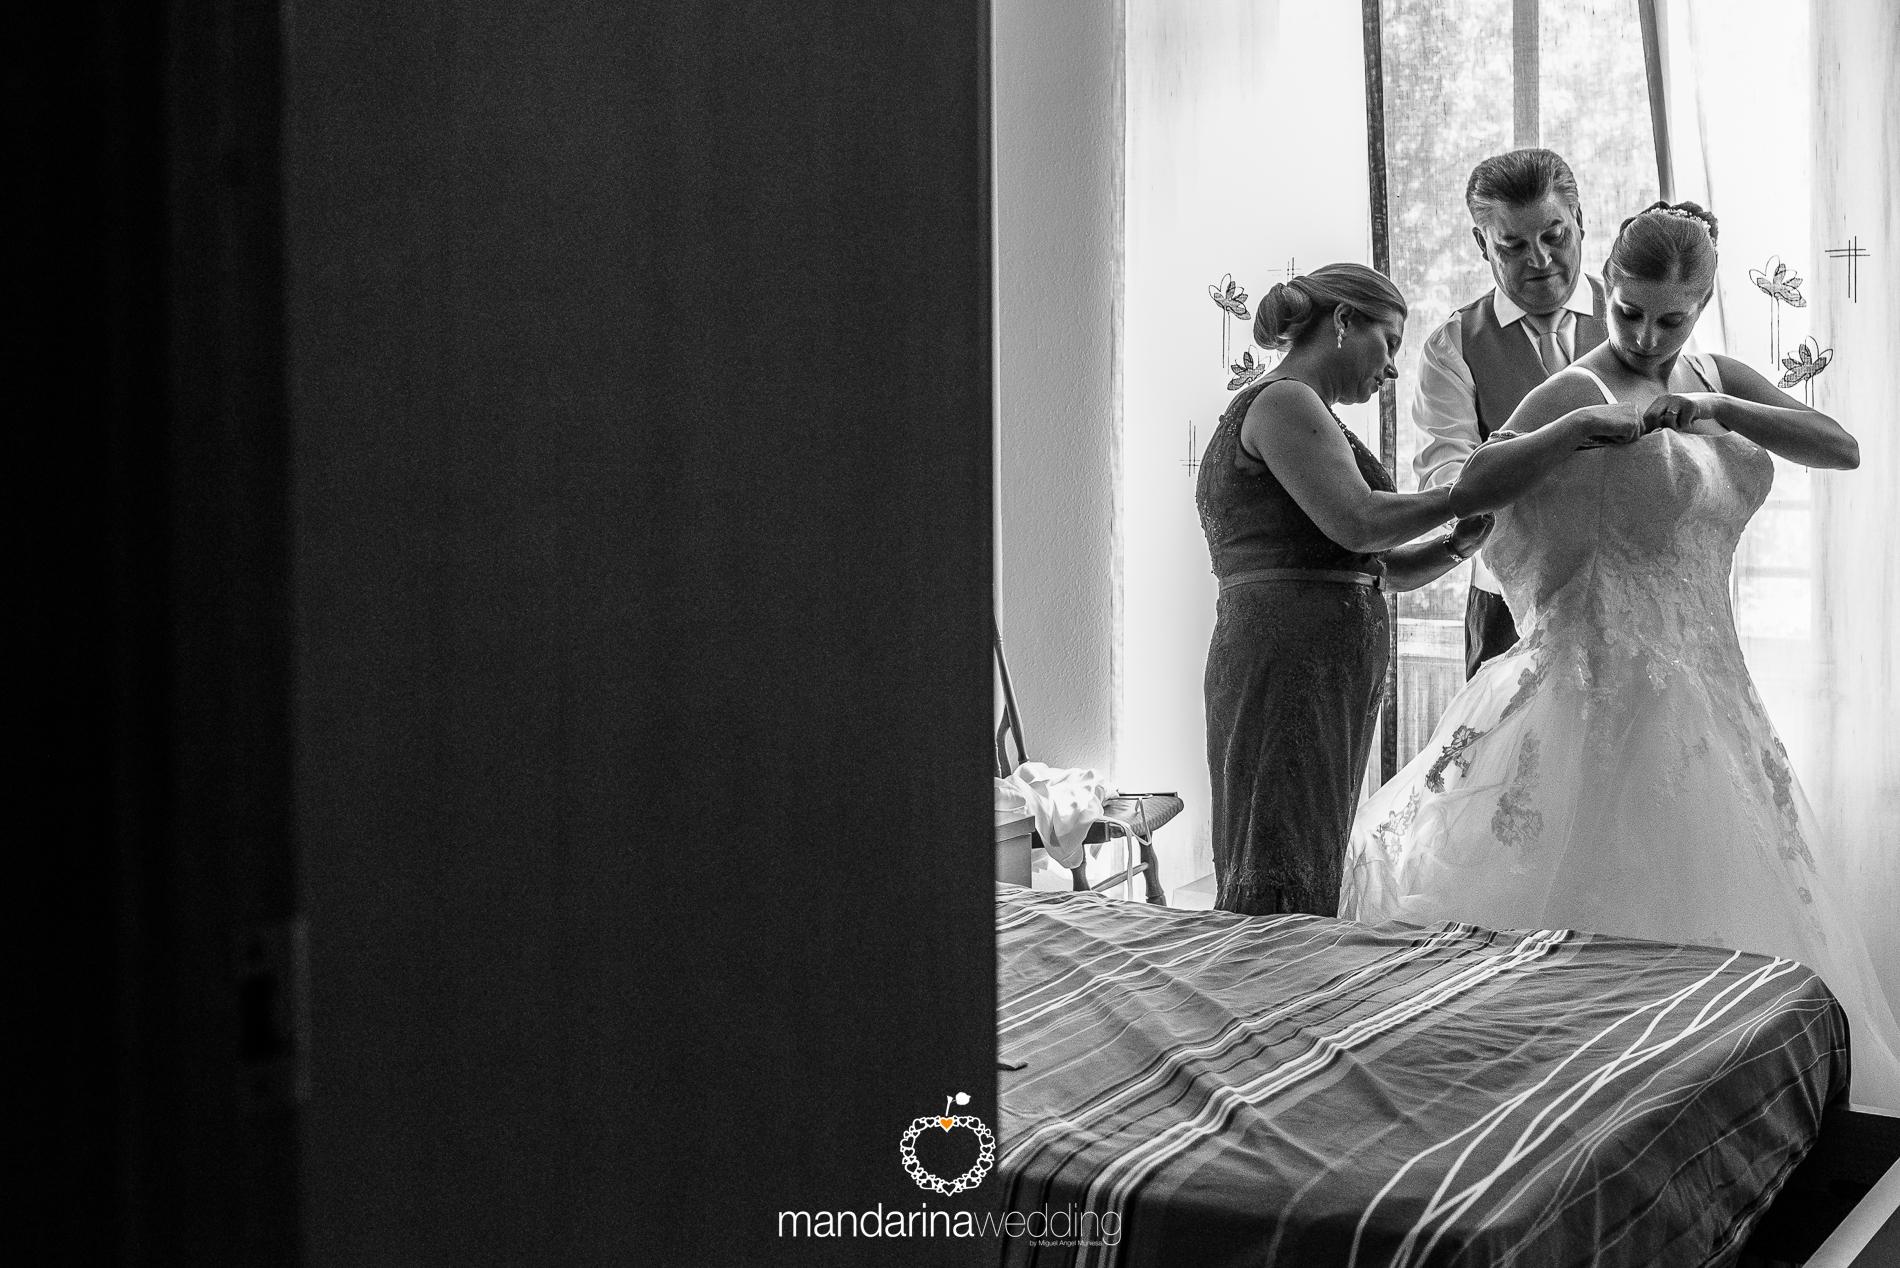 mandarina wedding, mejores fotografos boda, fotografo zaragoza, fotografo huesca, fotografo soria, fotografo lerida_52